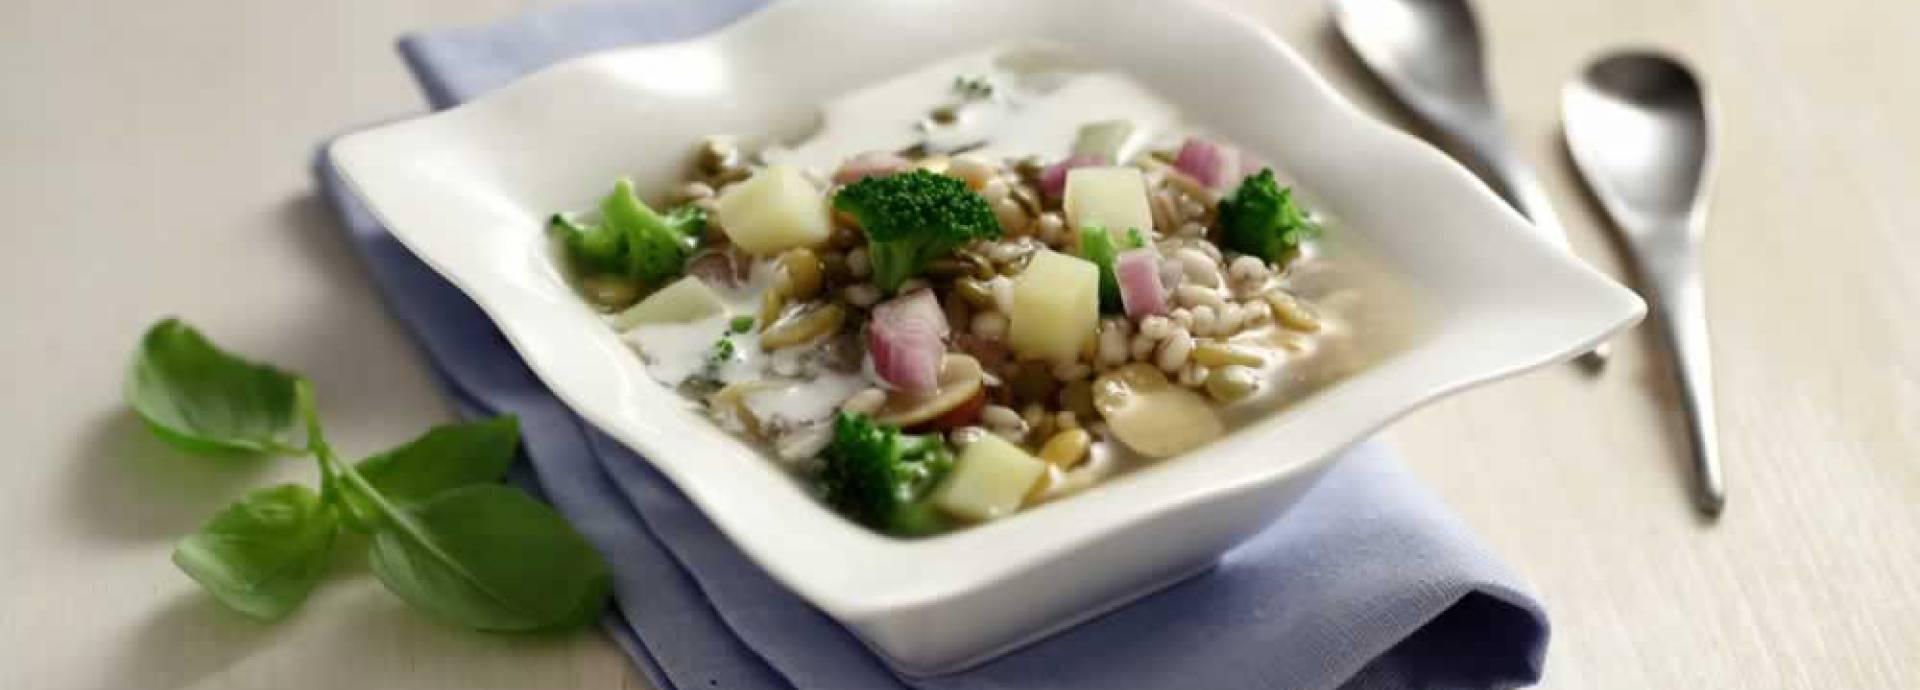 menu ricette facili dieta alcalina